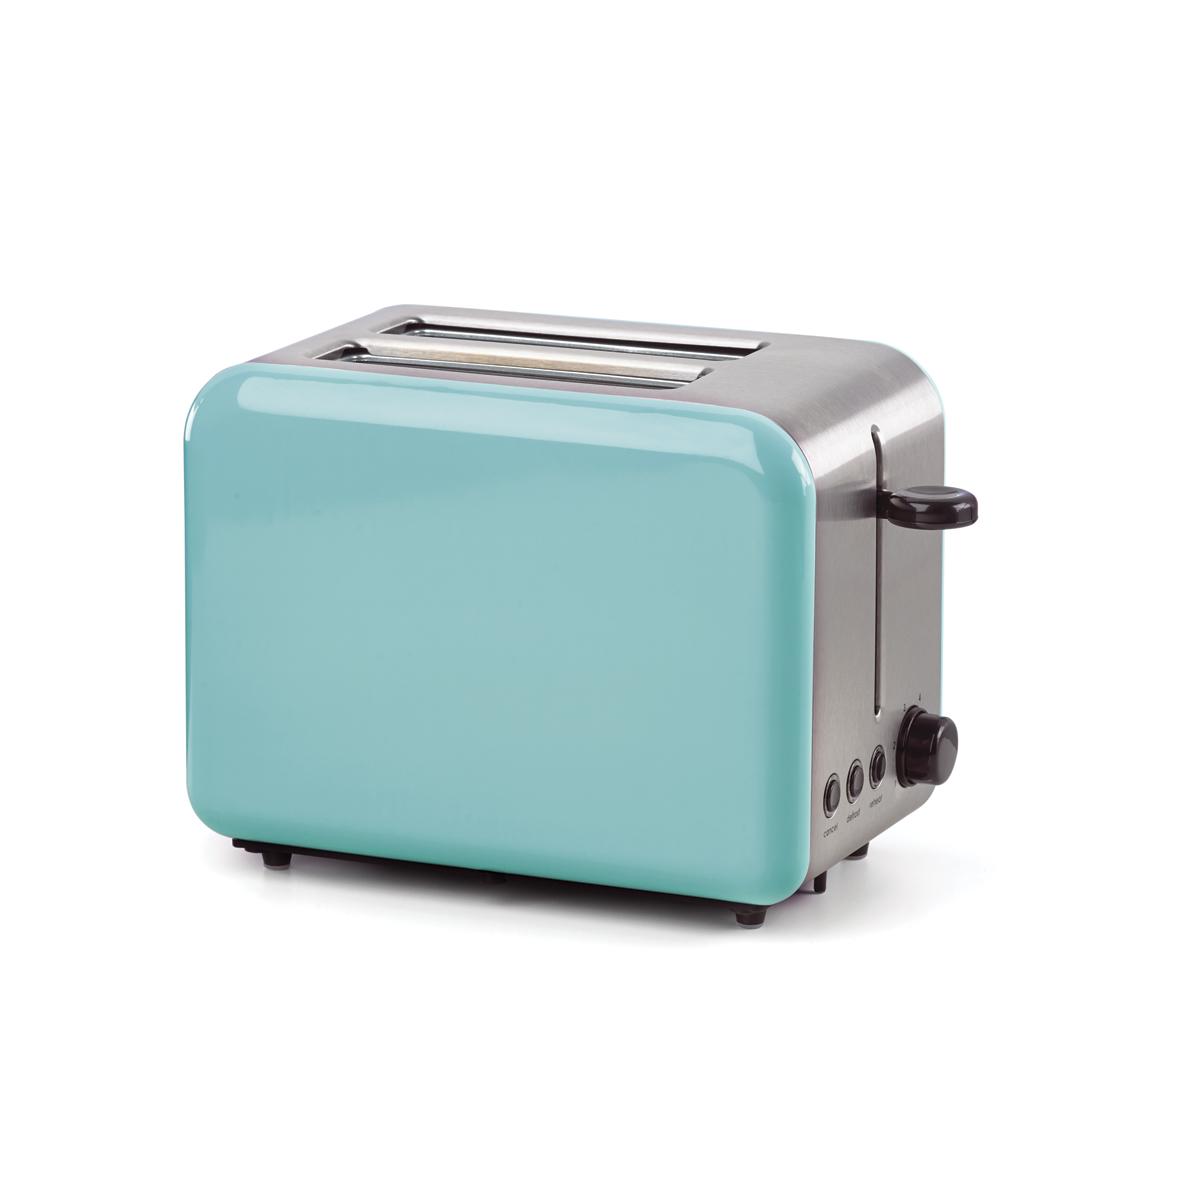 Kate Spade New York, Lenox All In Good Taste Toaster, 2 Slice Turquoise